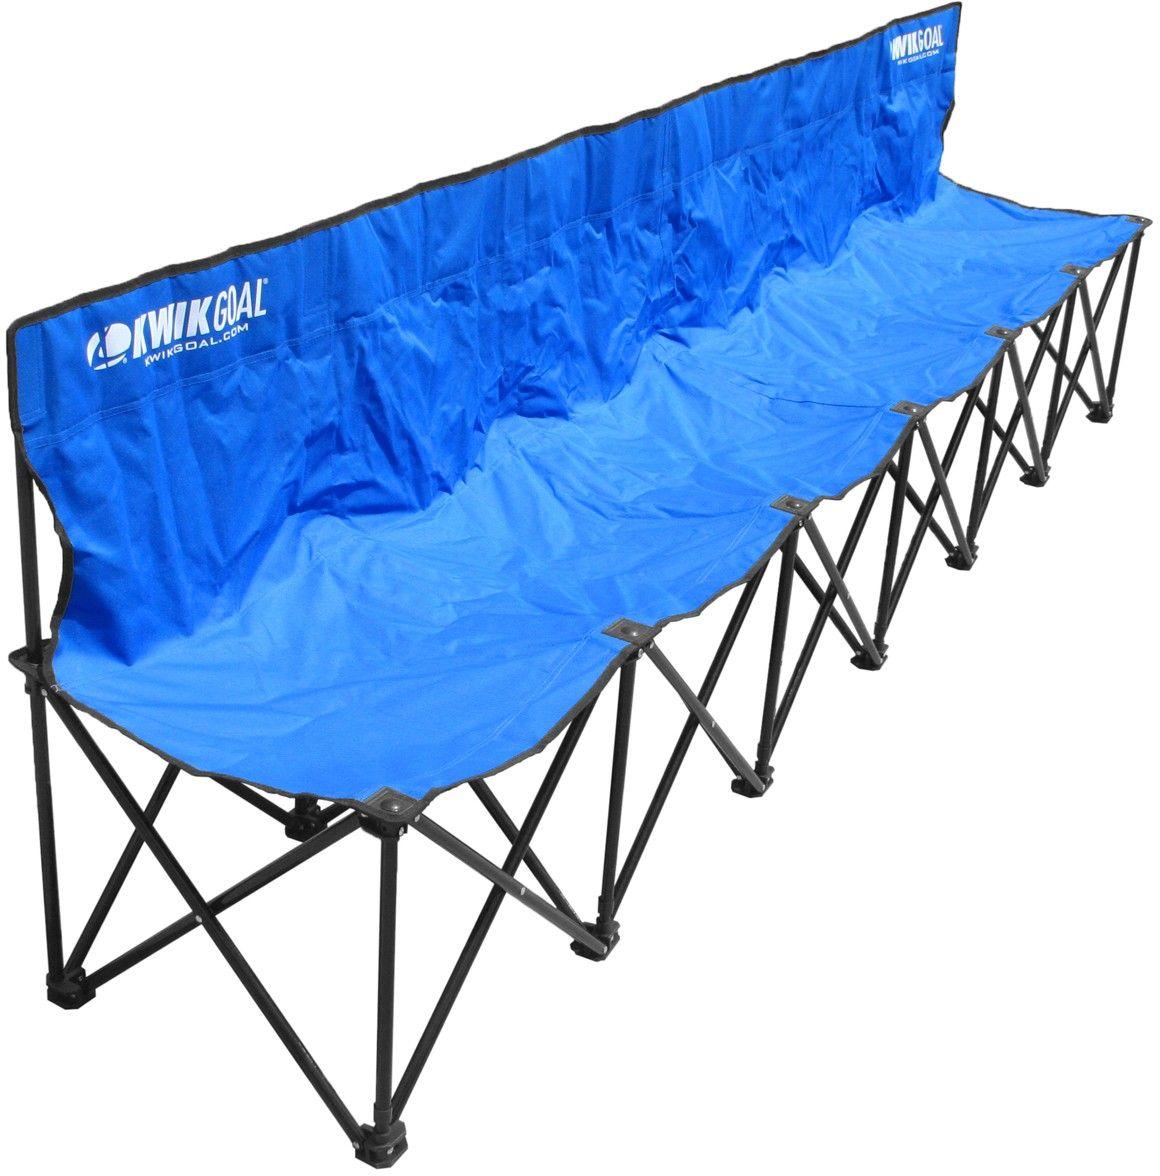 Sensational Kwik Goal 6 Seat Kwik Bench Folding Soccer Bench 9B906 Dailytribune Chair Design For Home Dailytribuneorg